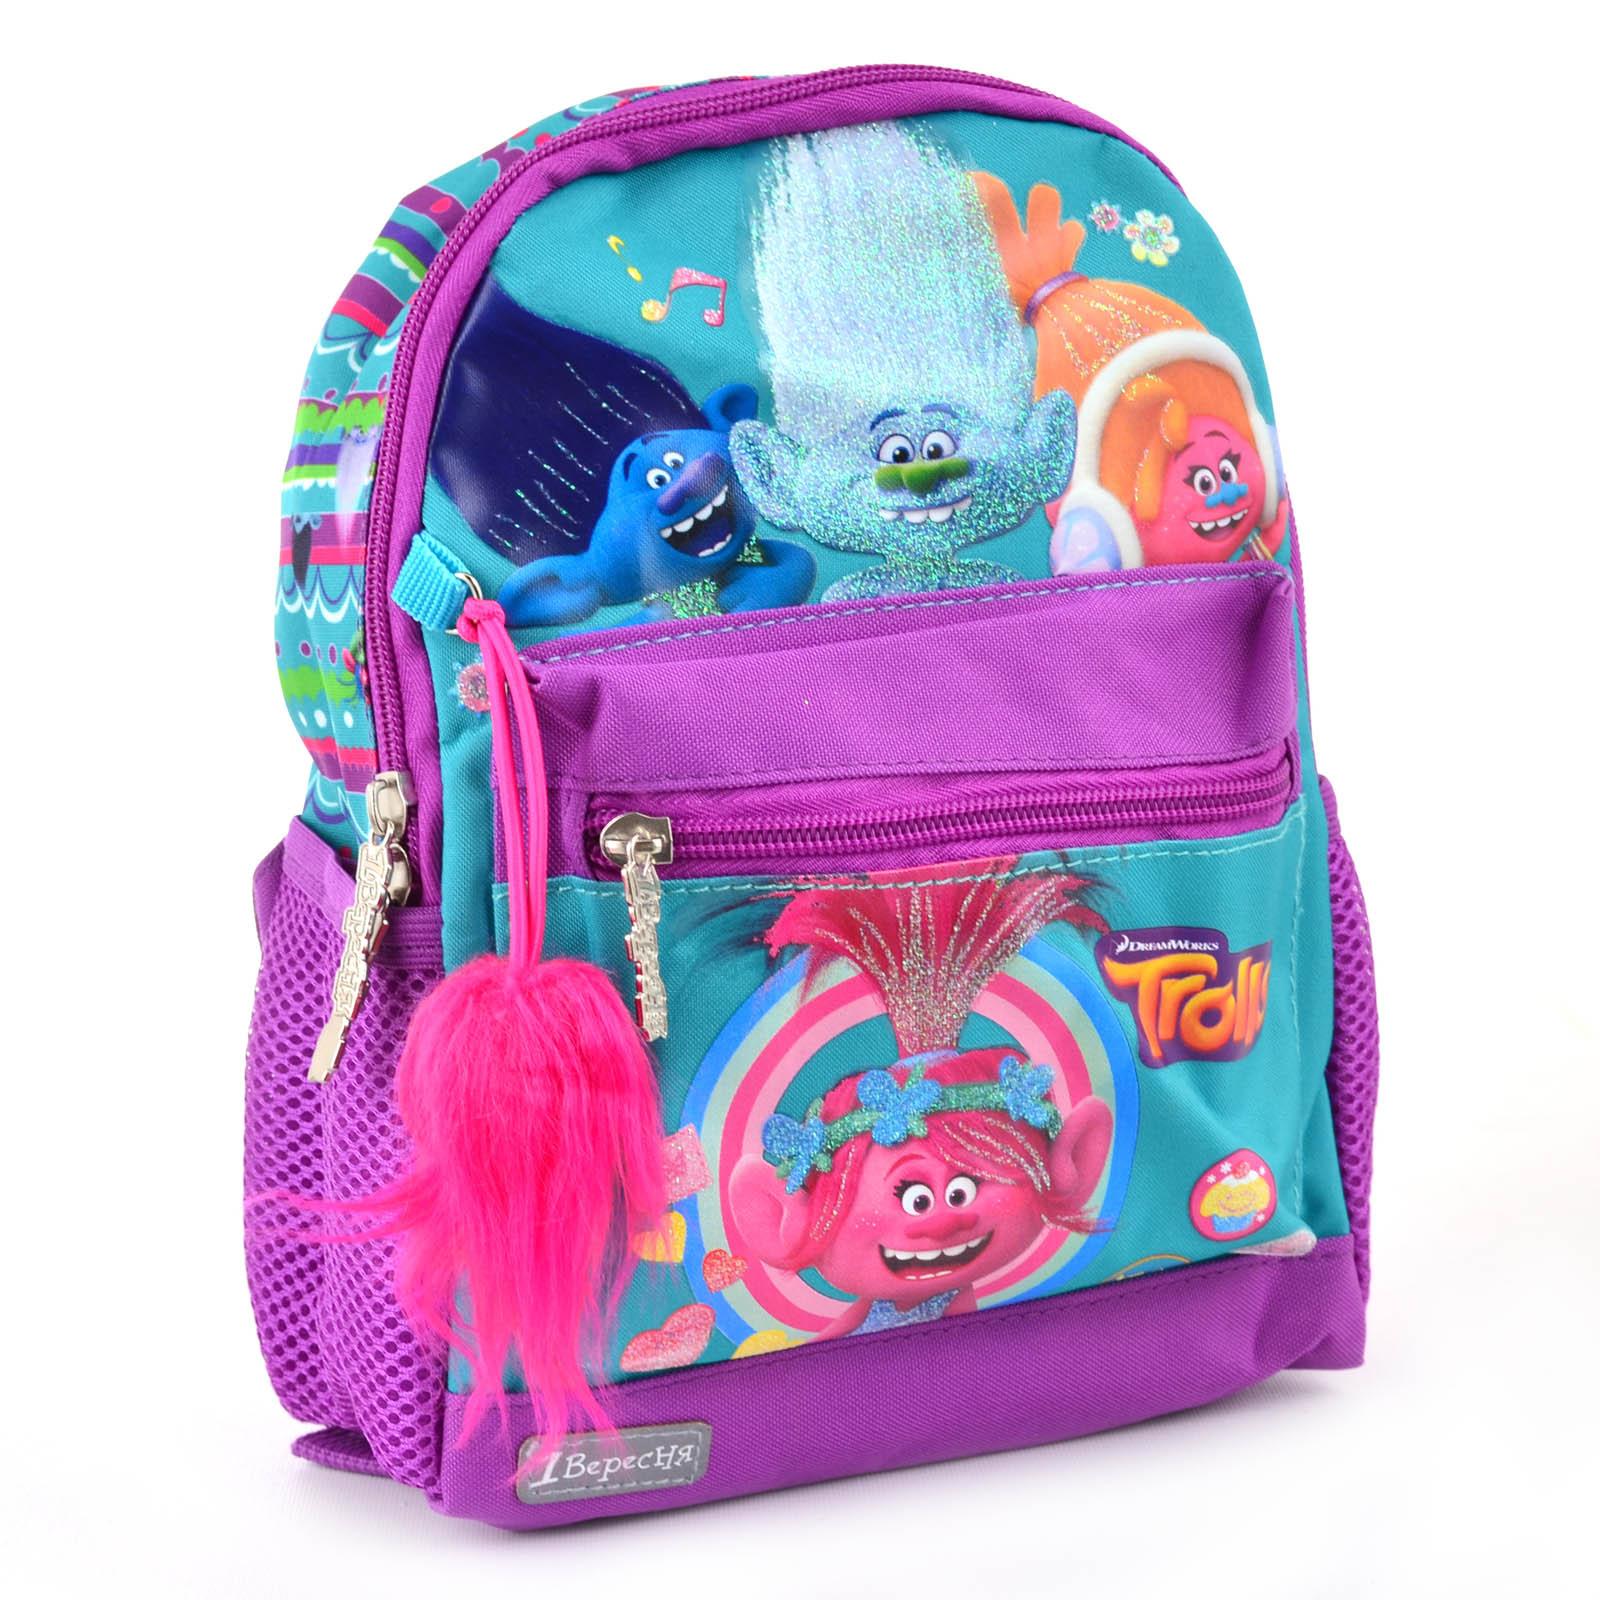 Рюкзак детский K-16 Trolls, 25.5*19.5*6.5